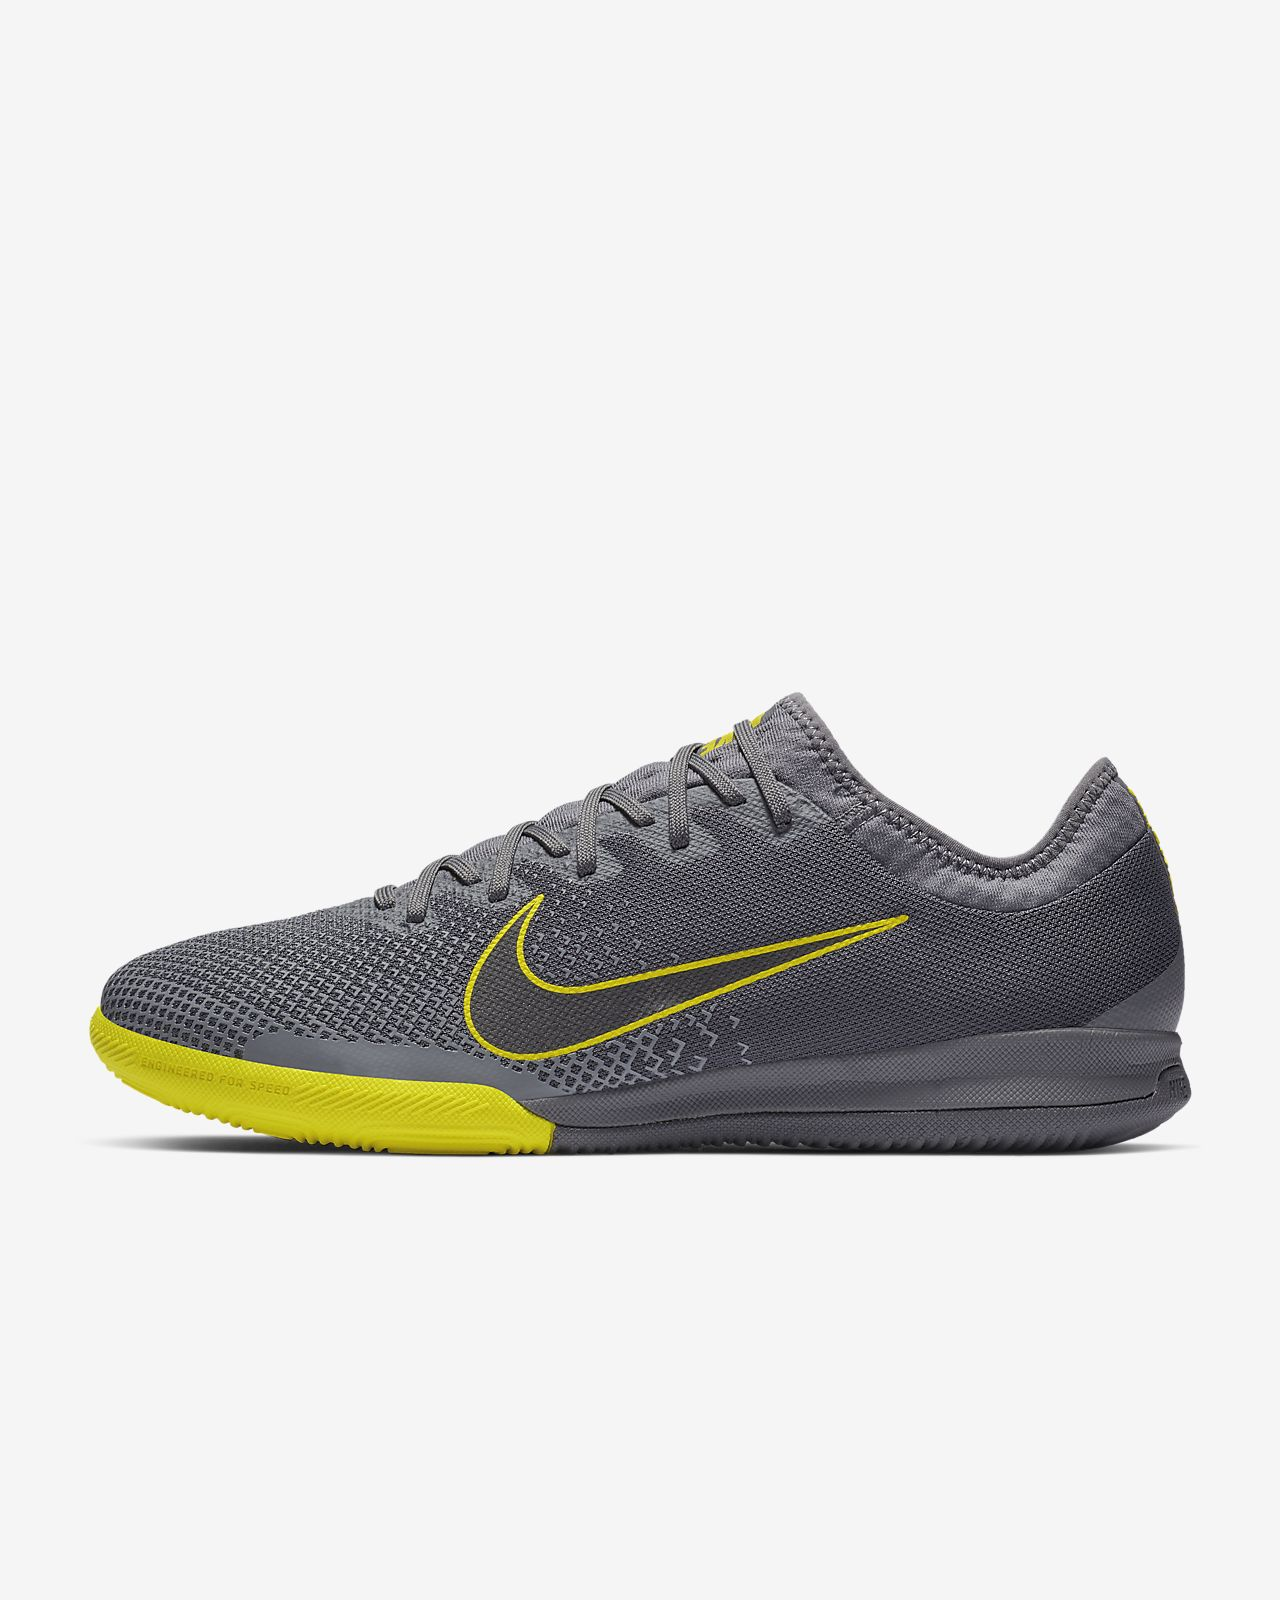 best sneakers 6e6bd 88660 ... Nike VaporX 12 Pro IC Game Over Botas de fútbol sala